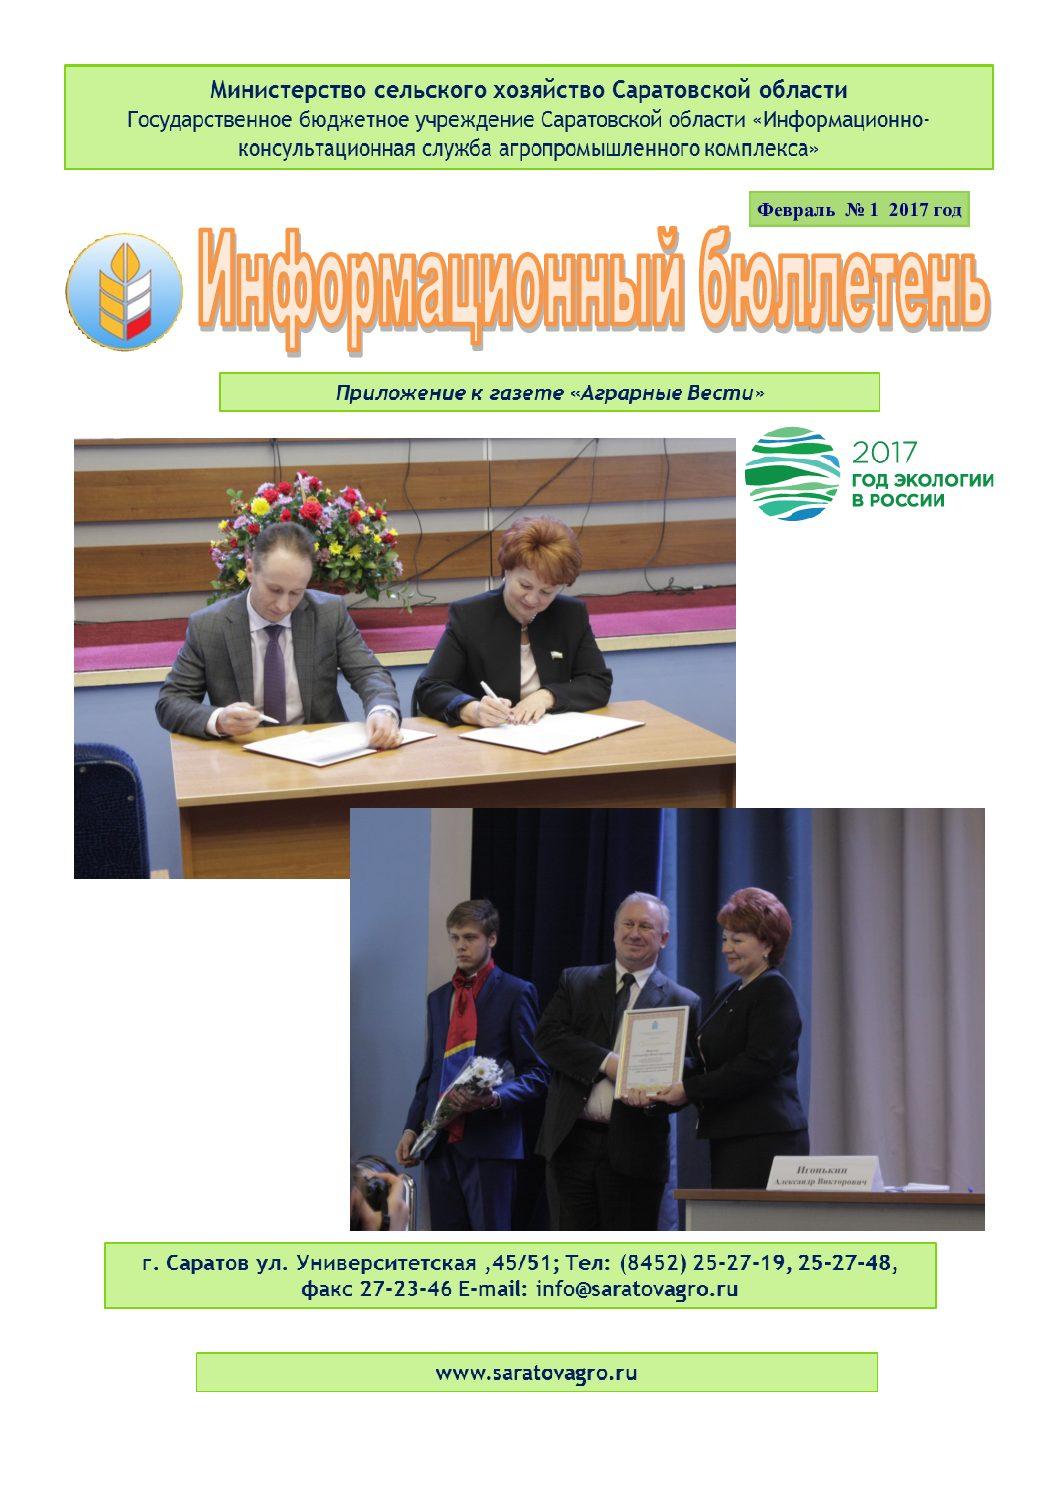 https://saratovagro.ru/wp-content/uploads/2020/08/1.2017-pdf.jpg